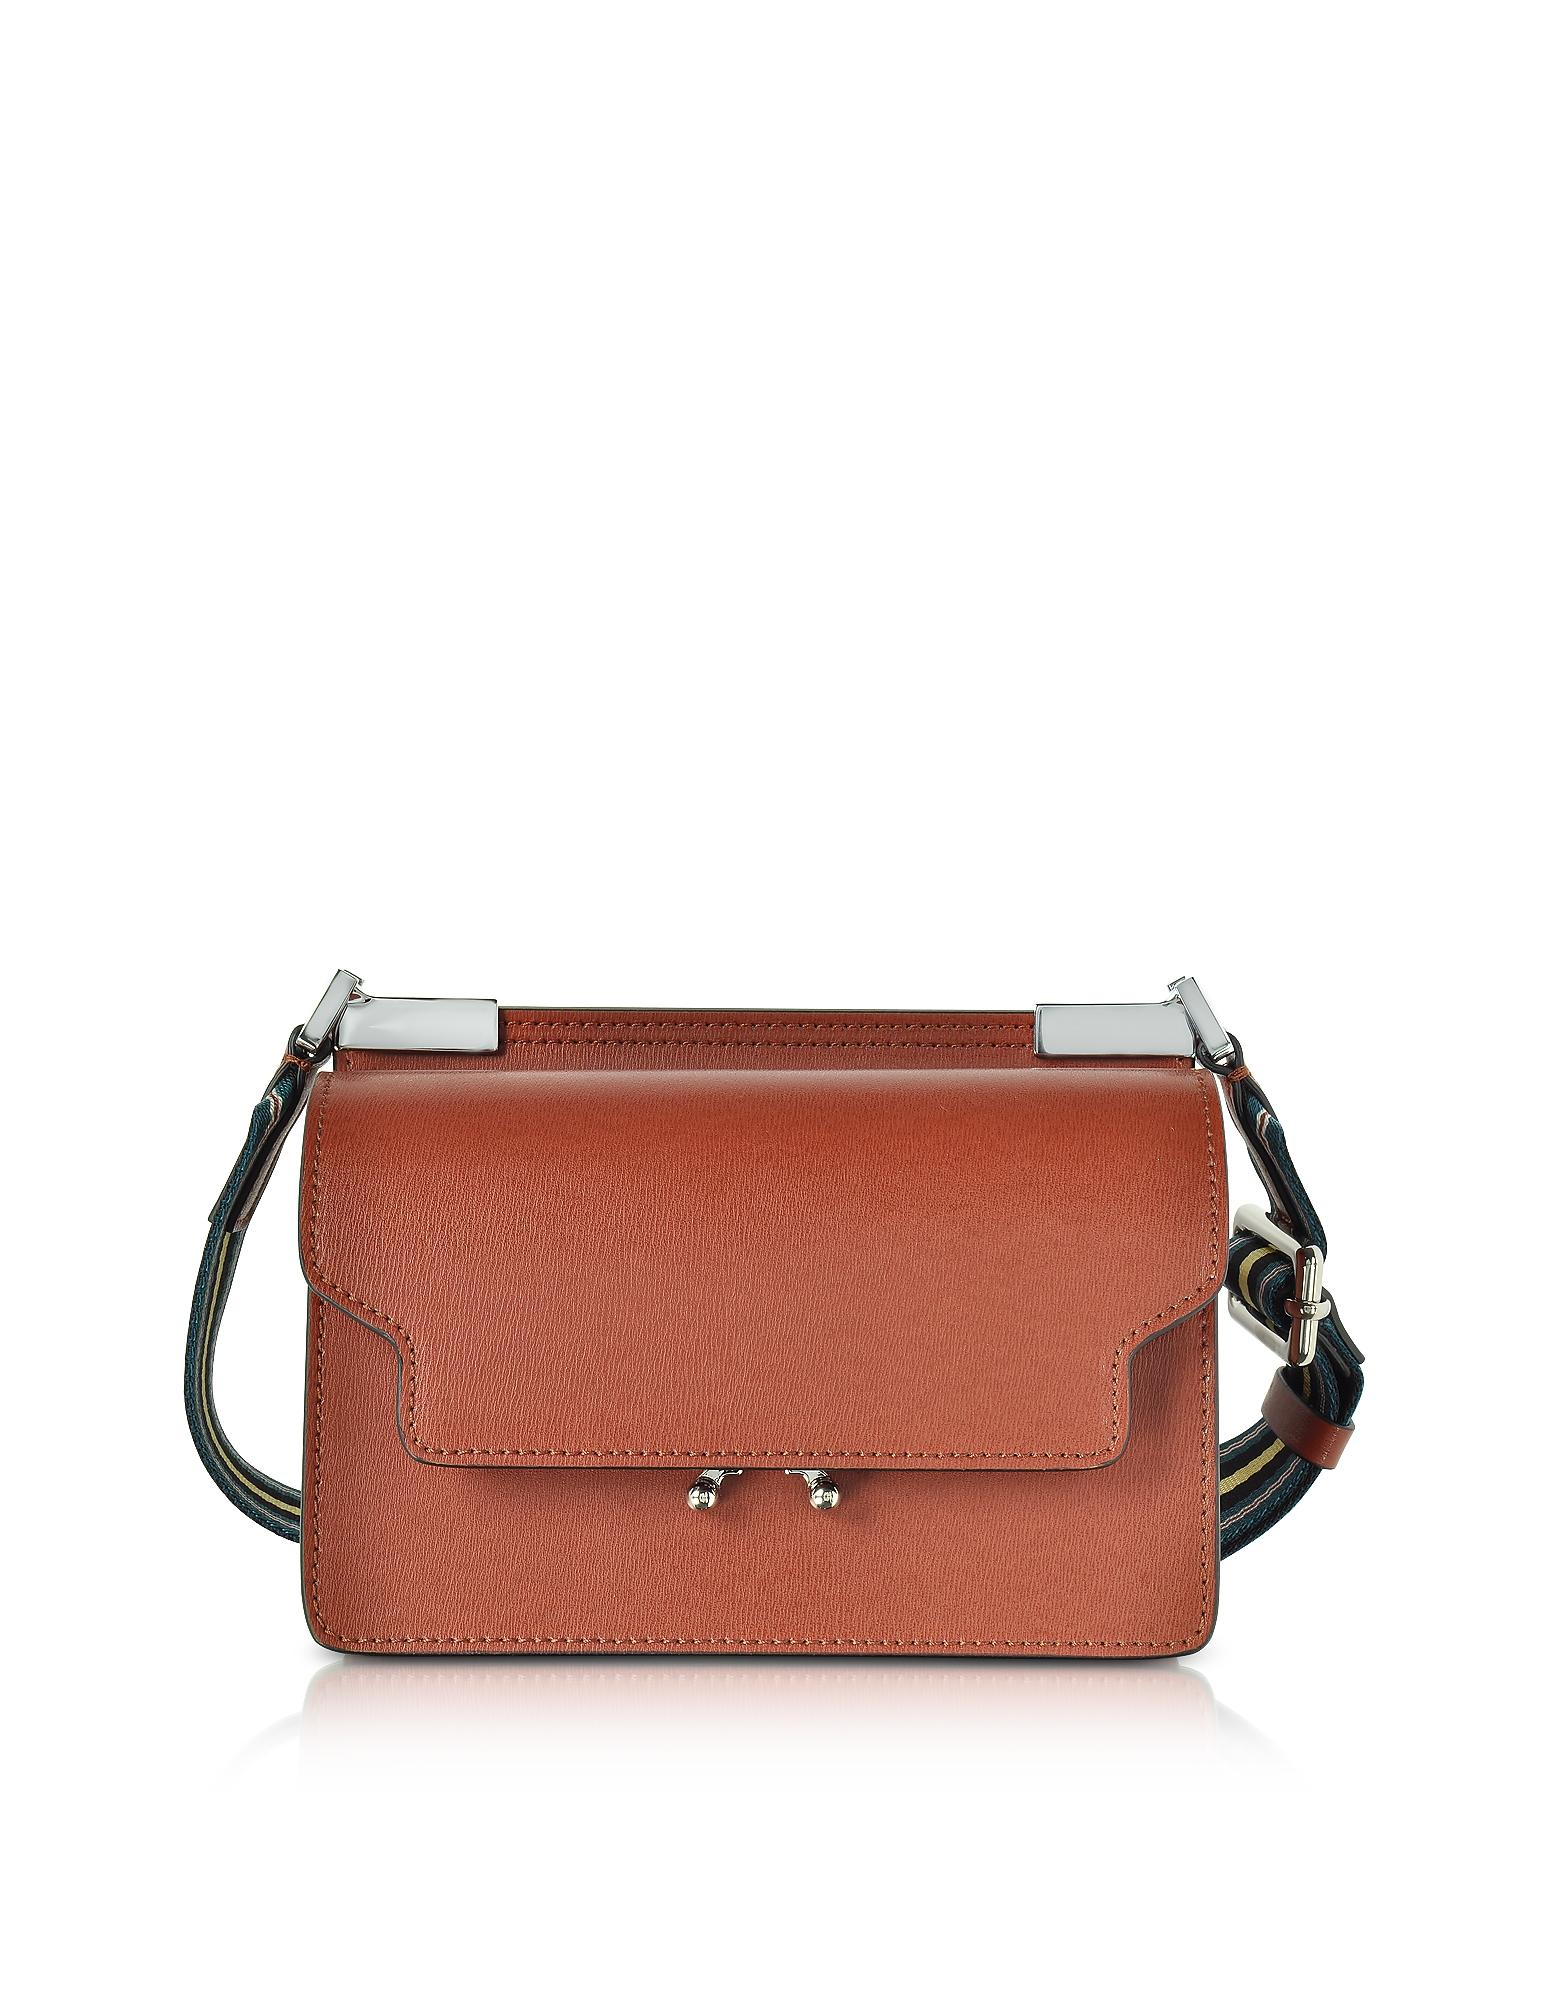 Marni Handbags, Brick Leather Trunk Bag w/Canvas Shoulder Strap